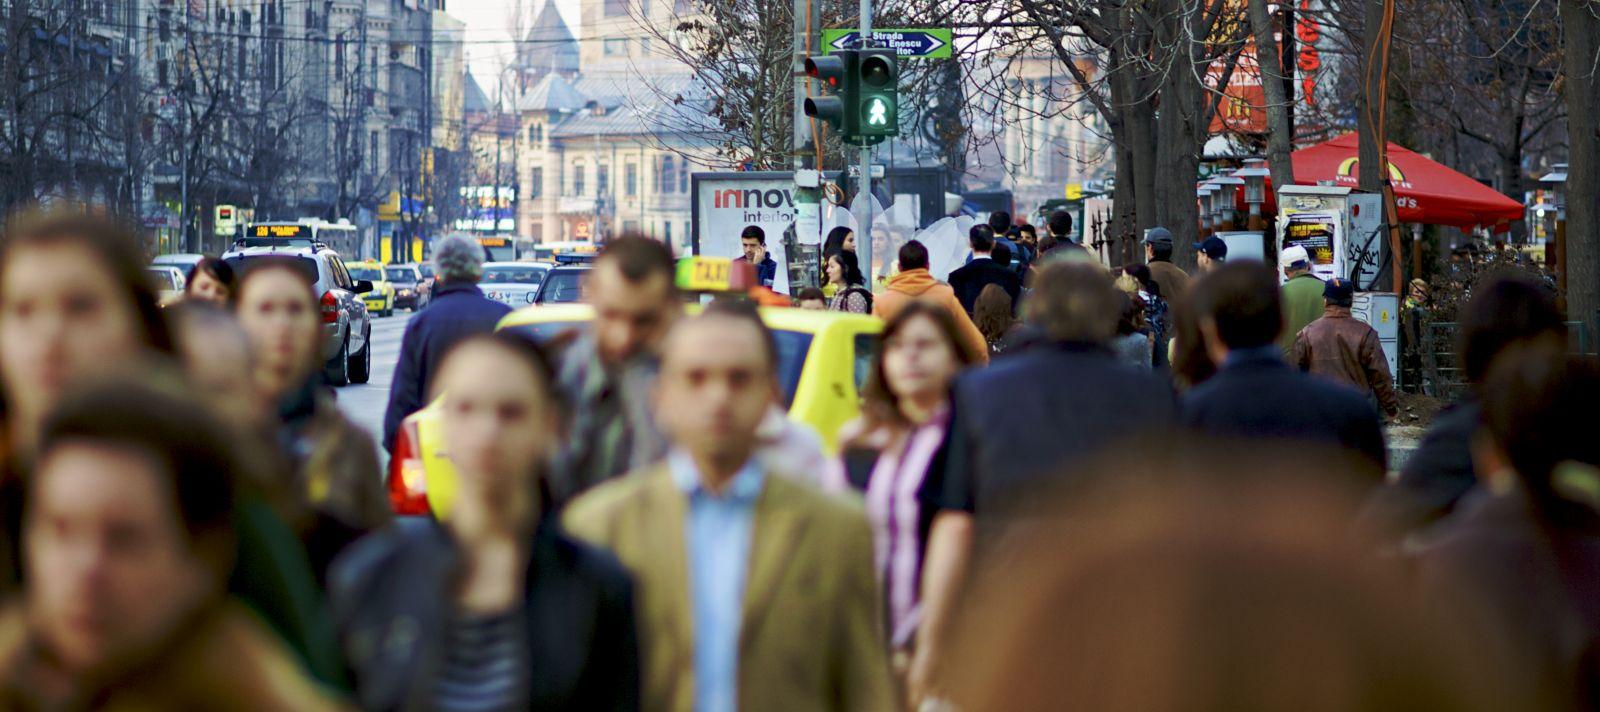 România, țara tuturor prejudecăților. Rolul mass-media în formarea opiniei românilor